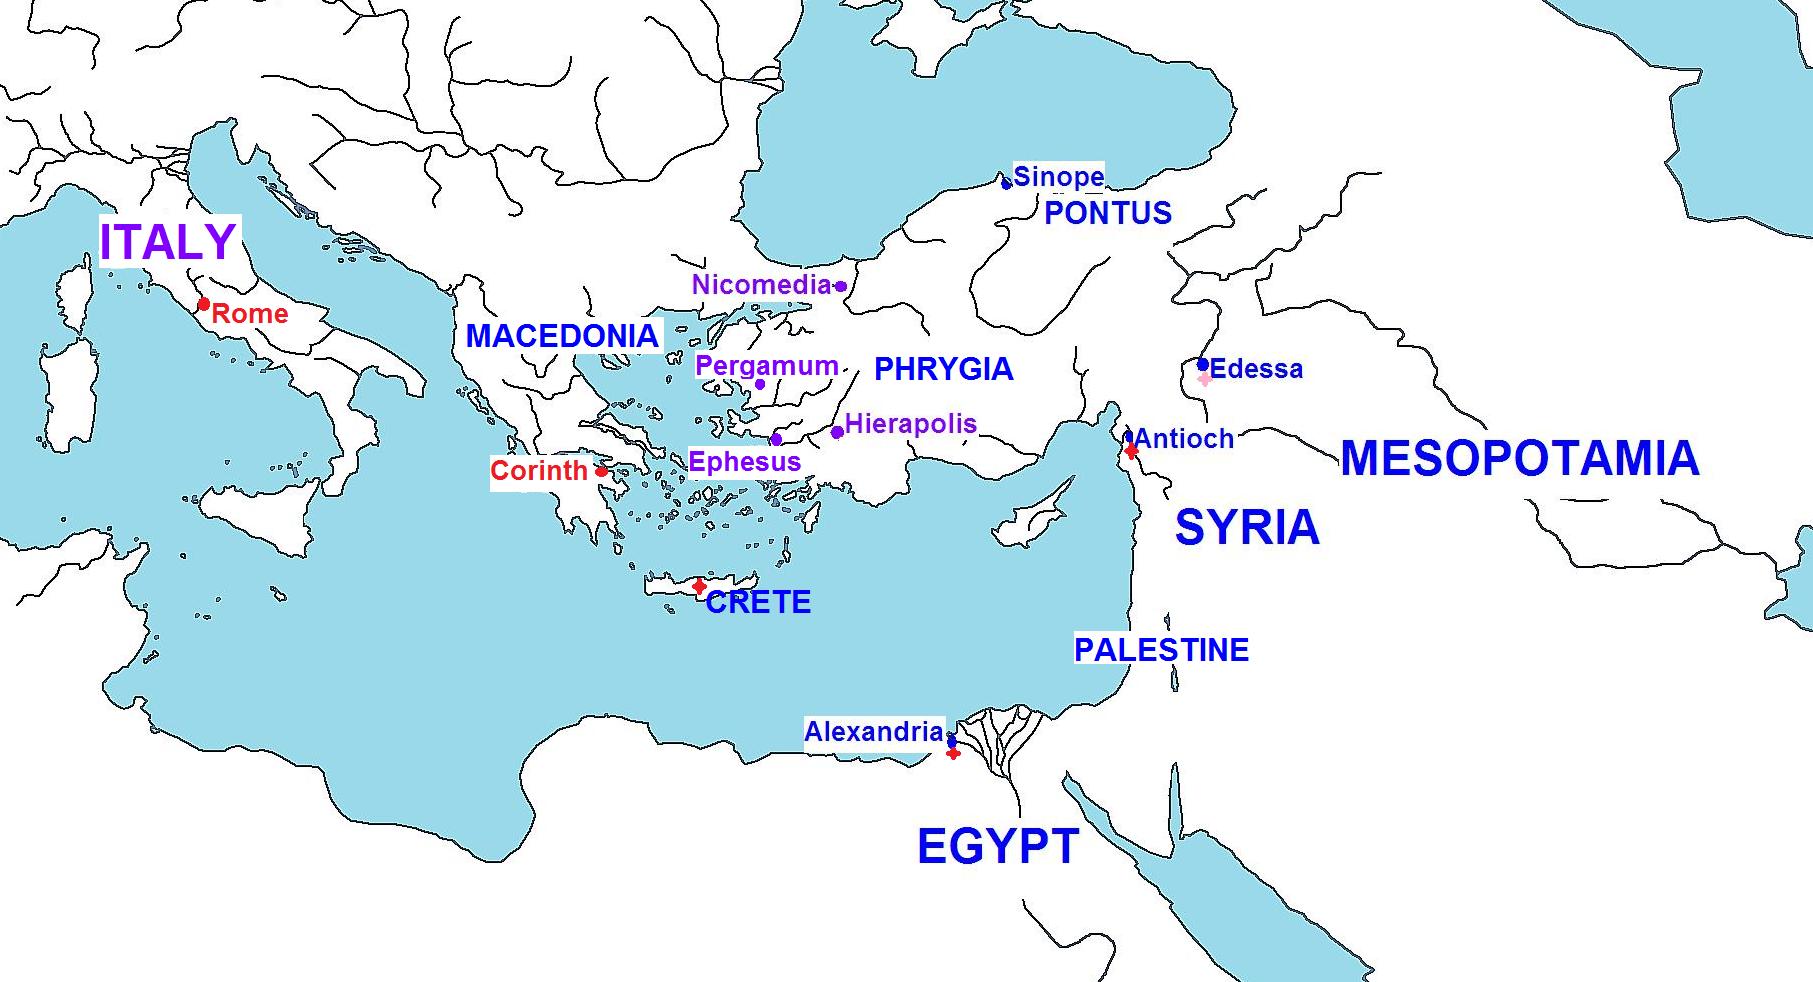 Mediterranean map google search heritage pinterest mediterranean map google search gumiabroncs Images